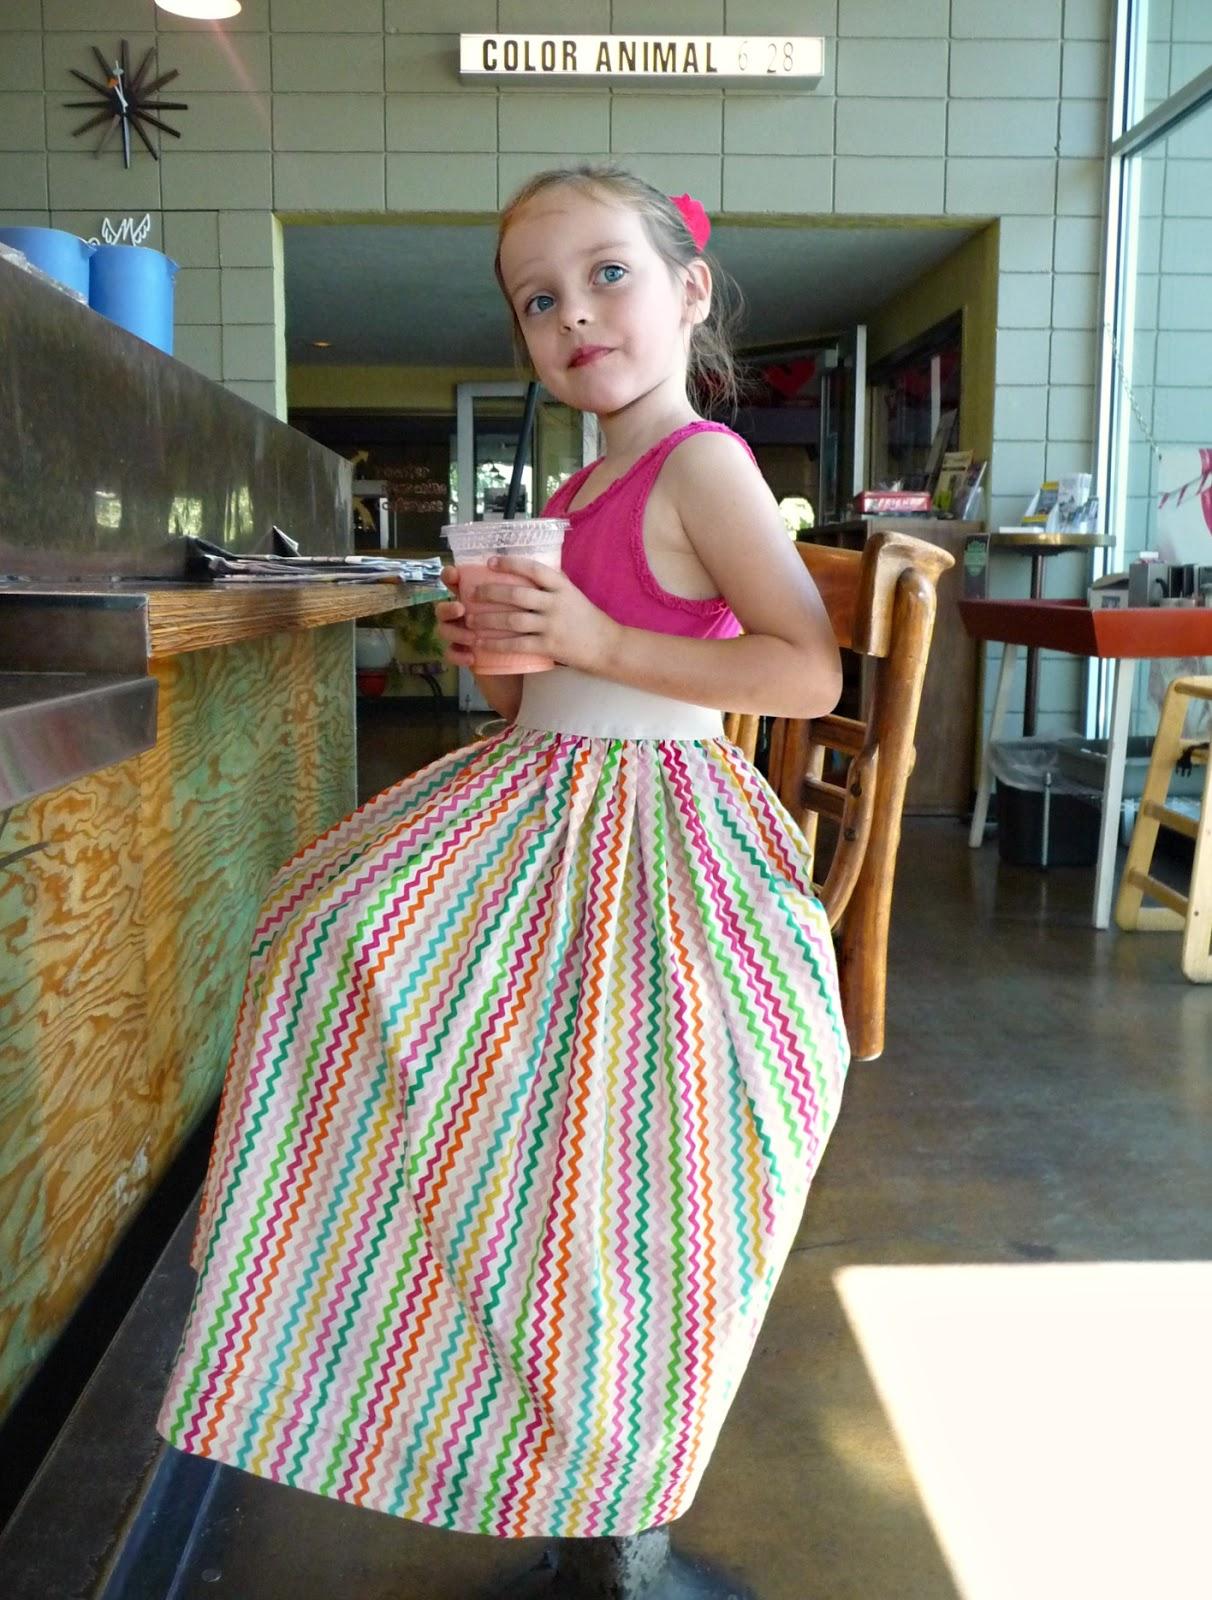 http://www.domesticblisssquared.com/2013/08/the-urban-princess-dress-full-tutorial.html